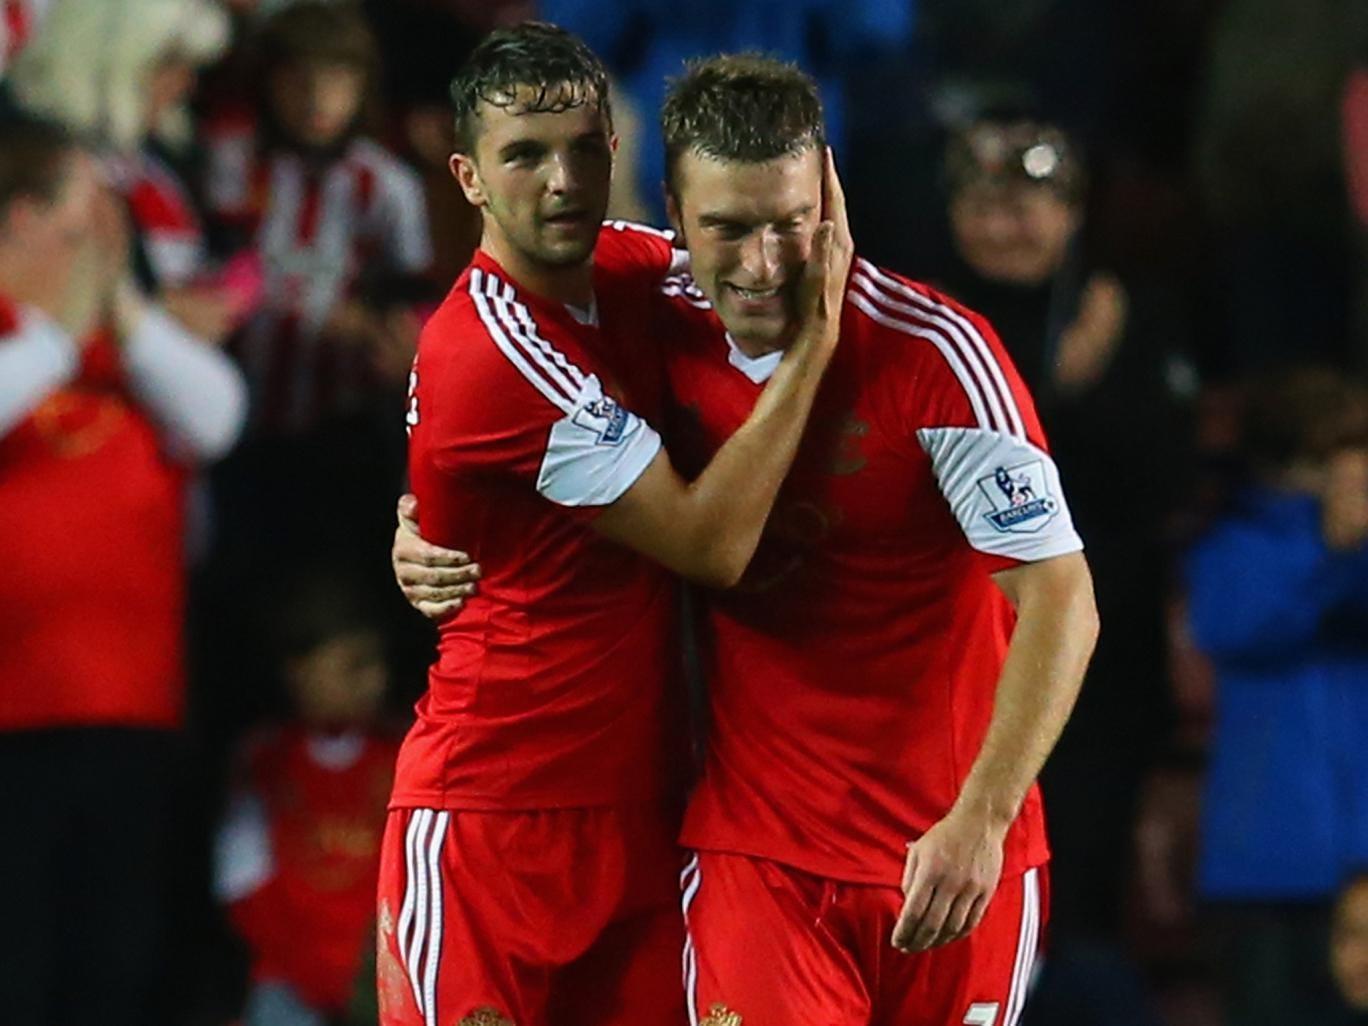 Southampton strikers Jay Rodriguez and Rickie Lambert enjoyed a fruitful evening against Fulham.